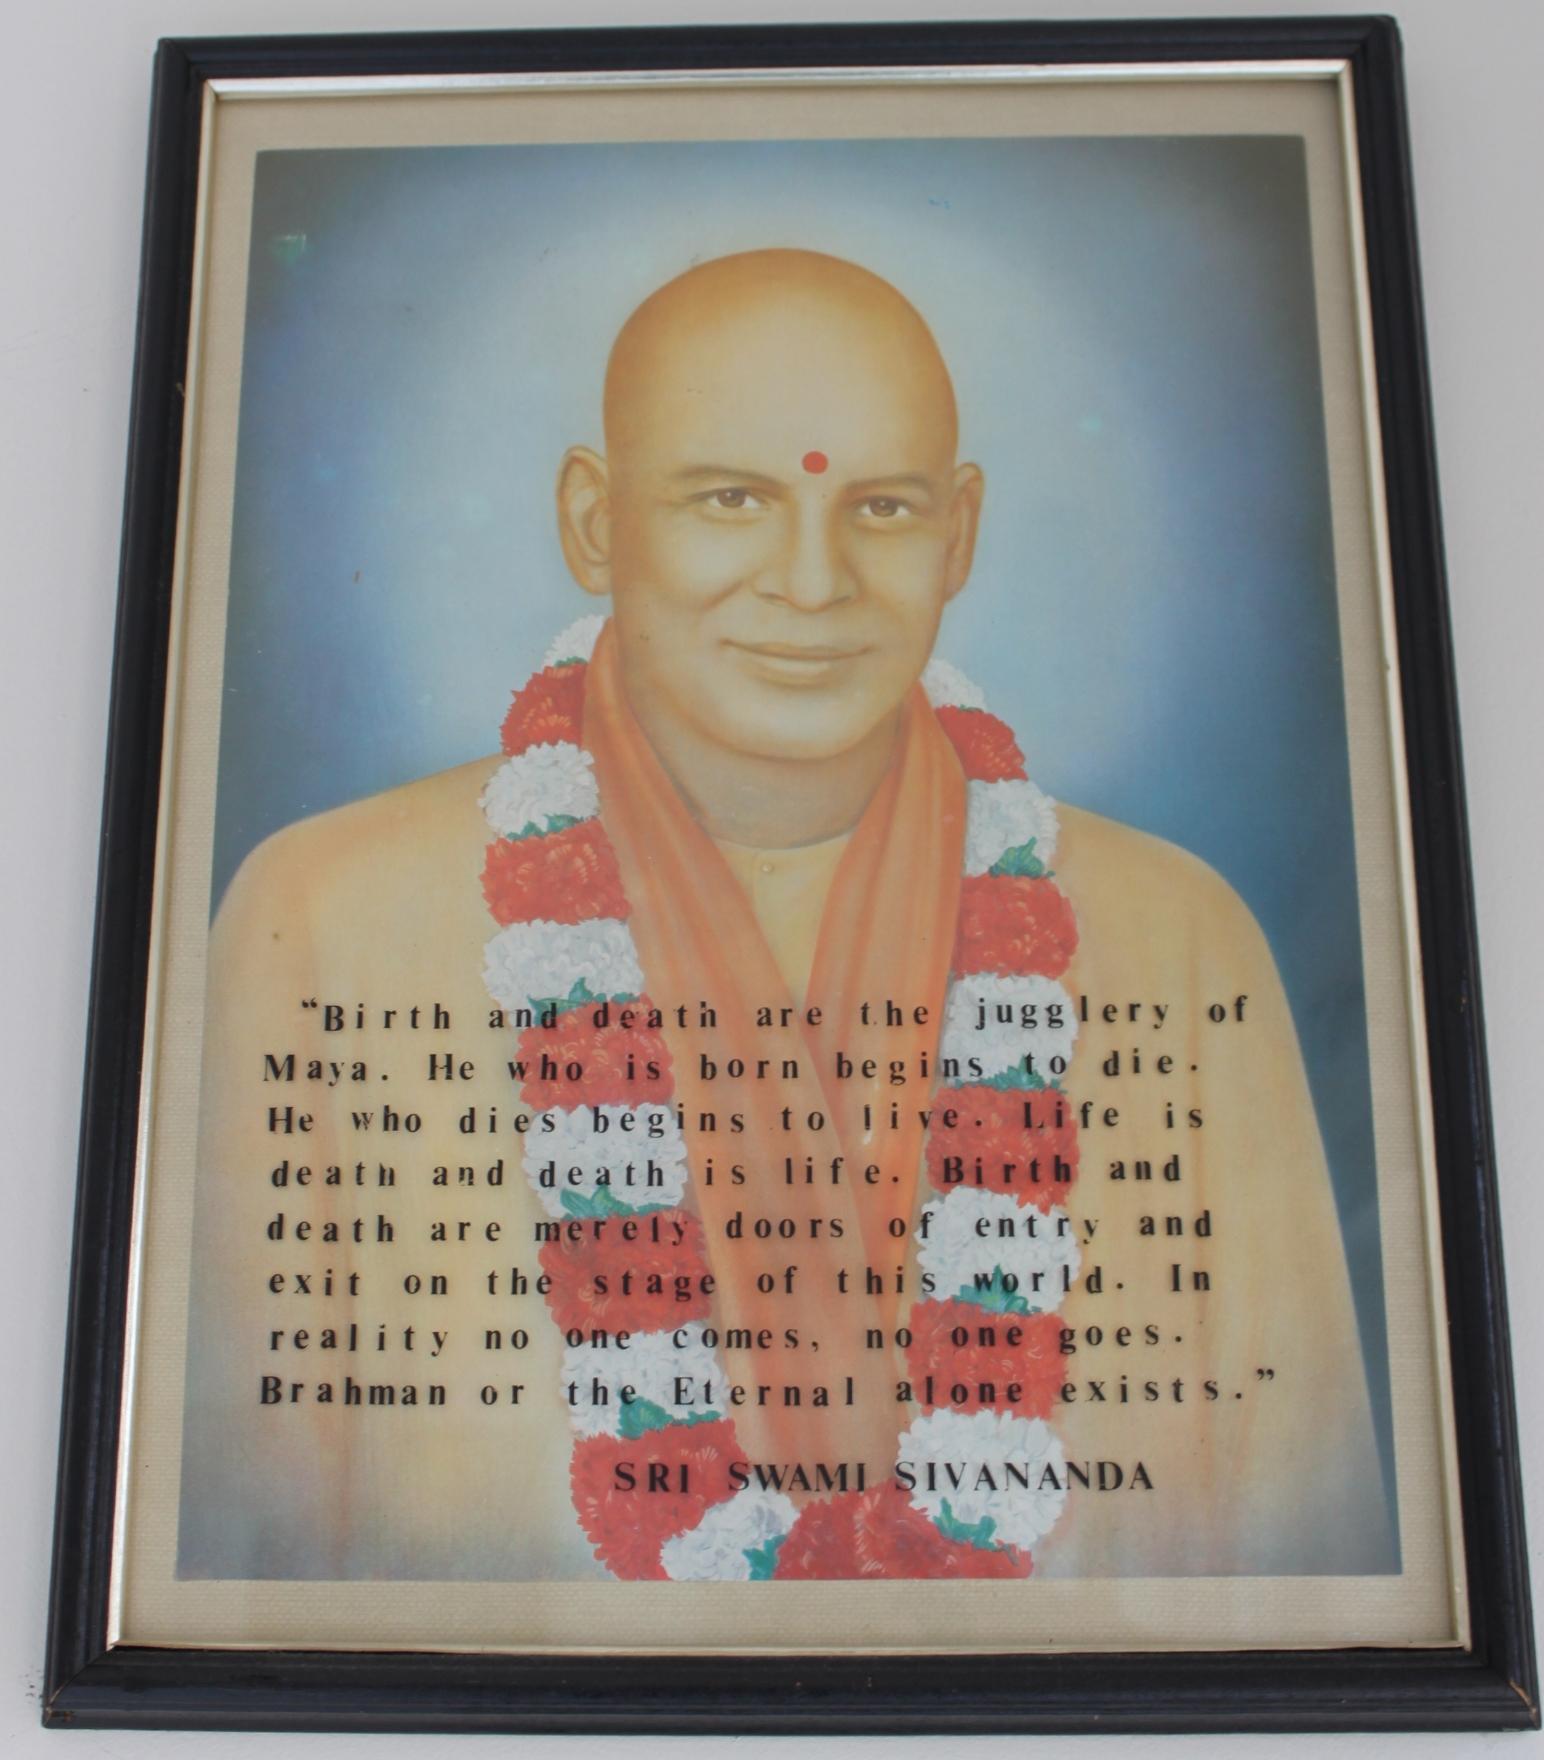 Swami Sivananda.jpg